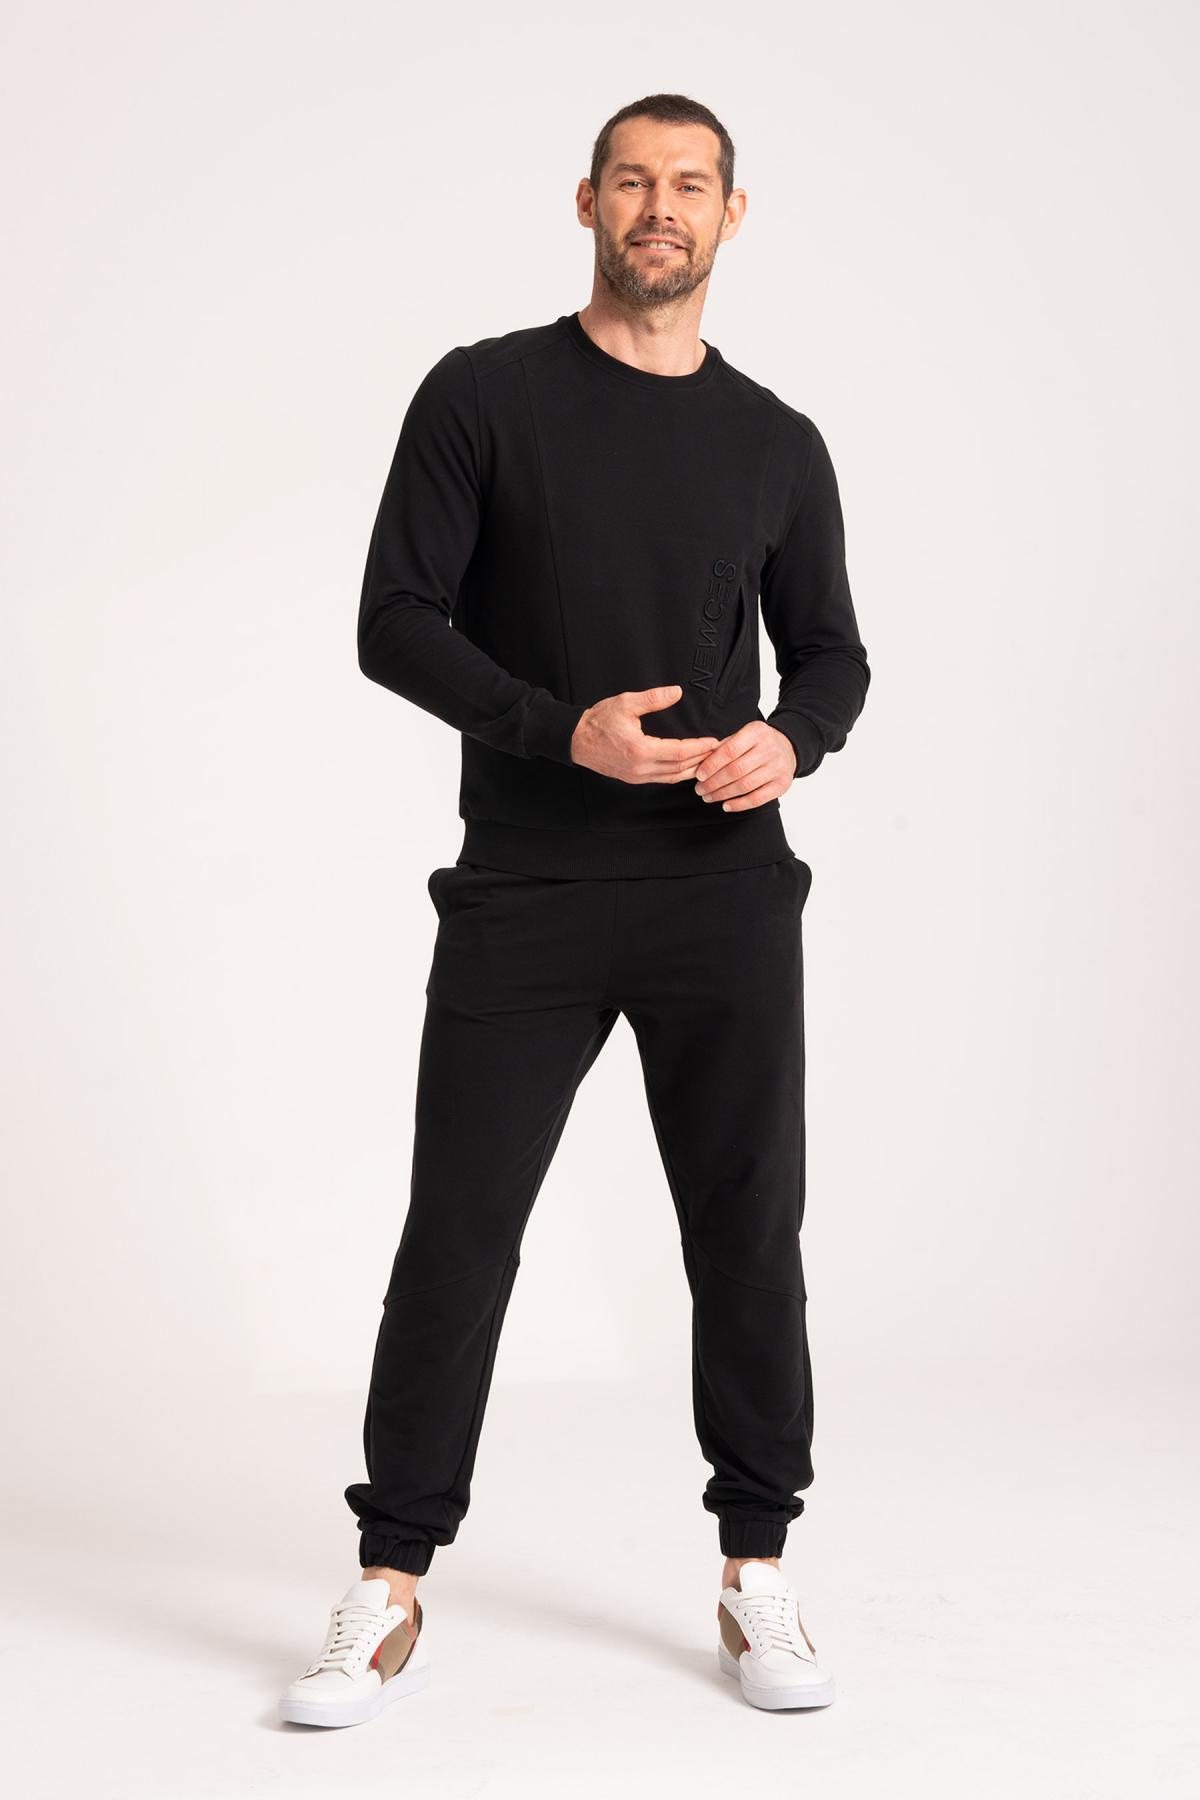 Sweatshirt 95% Cotton newces-5013-B